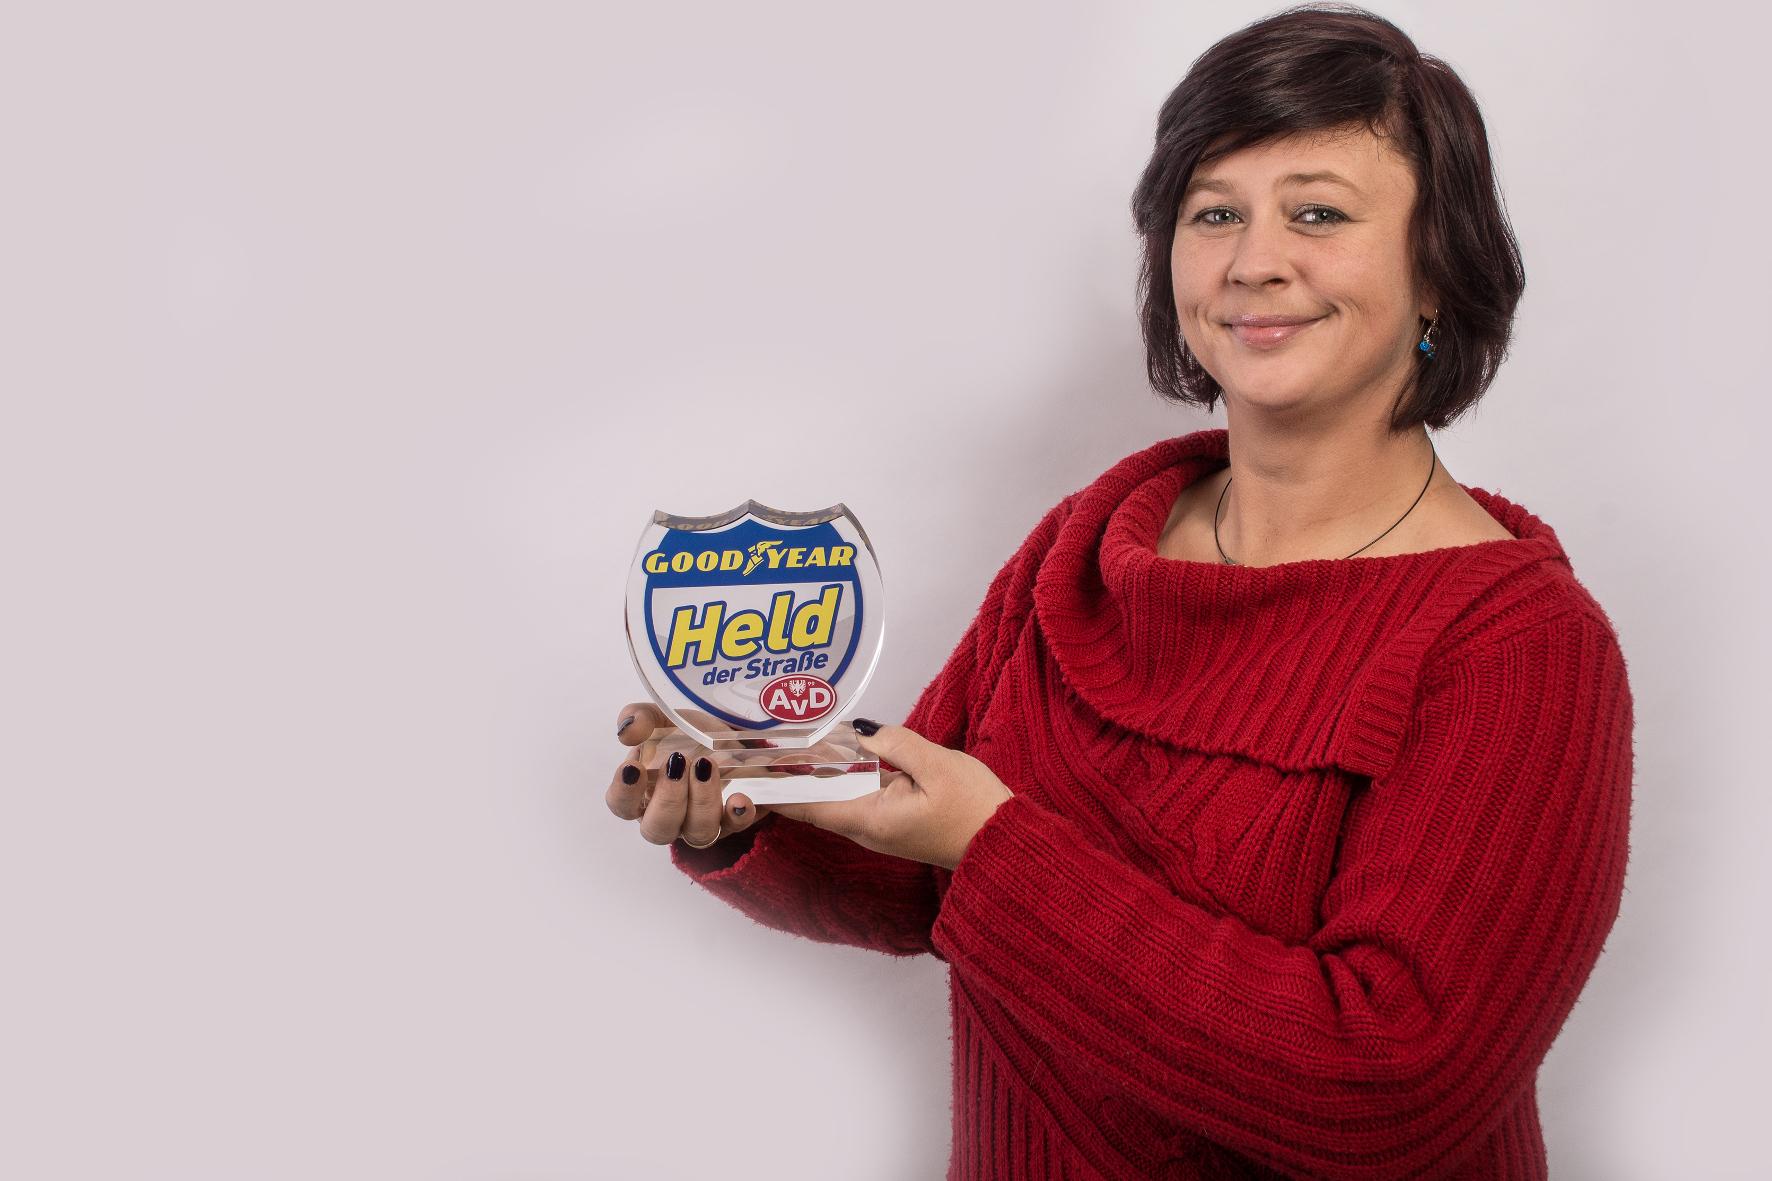 mid Groß-Gerau - Die Heldin der Straße des Monats Oktober: Andrea Hübner (36) aus Elsfleth. Goodyear / AvD